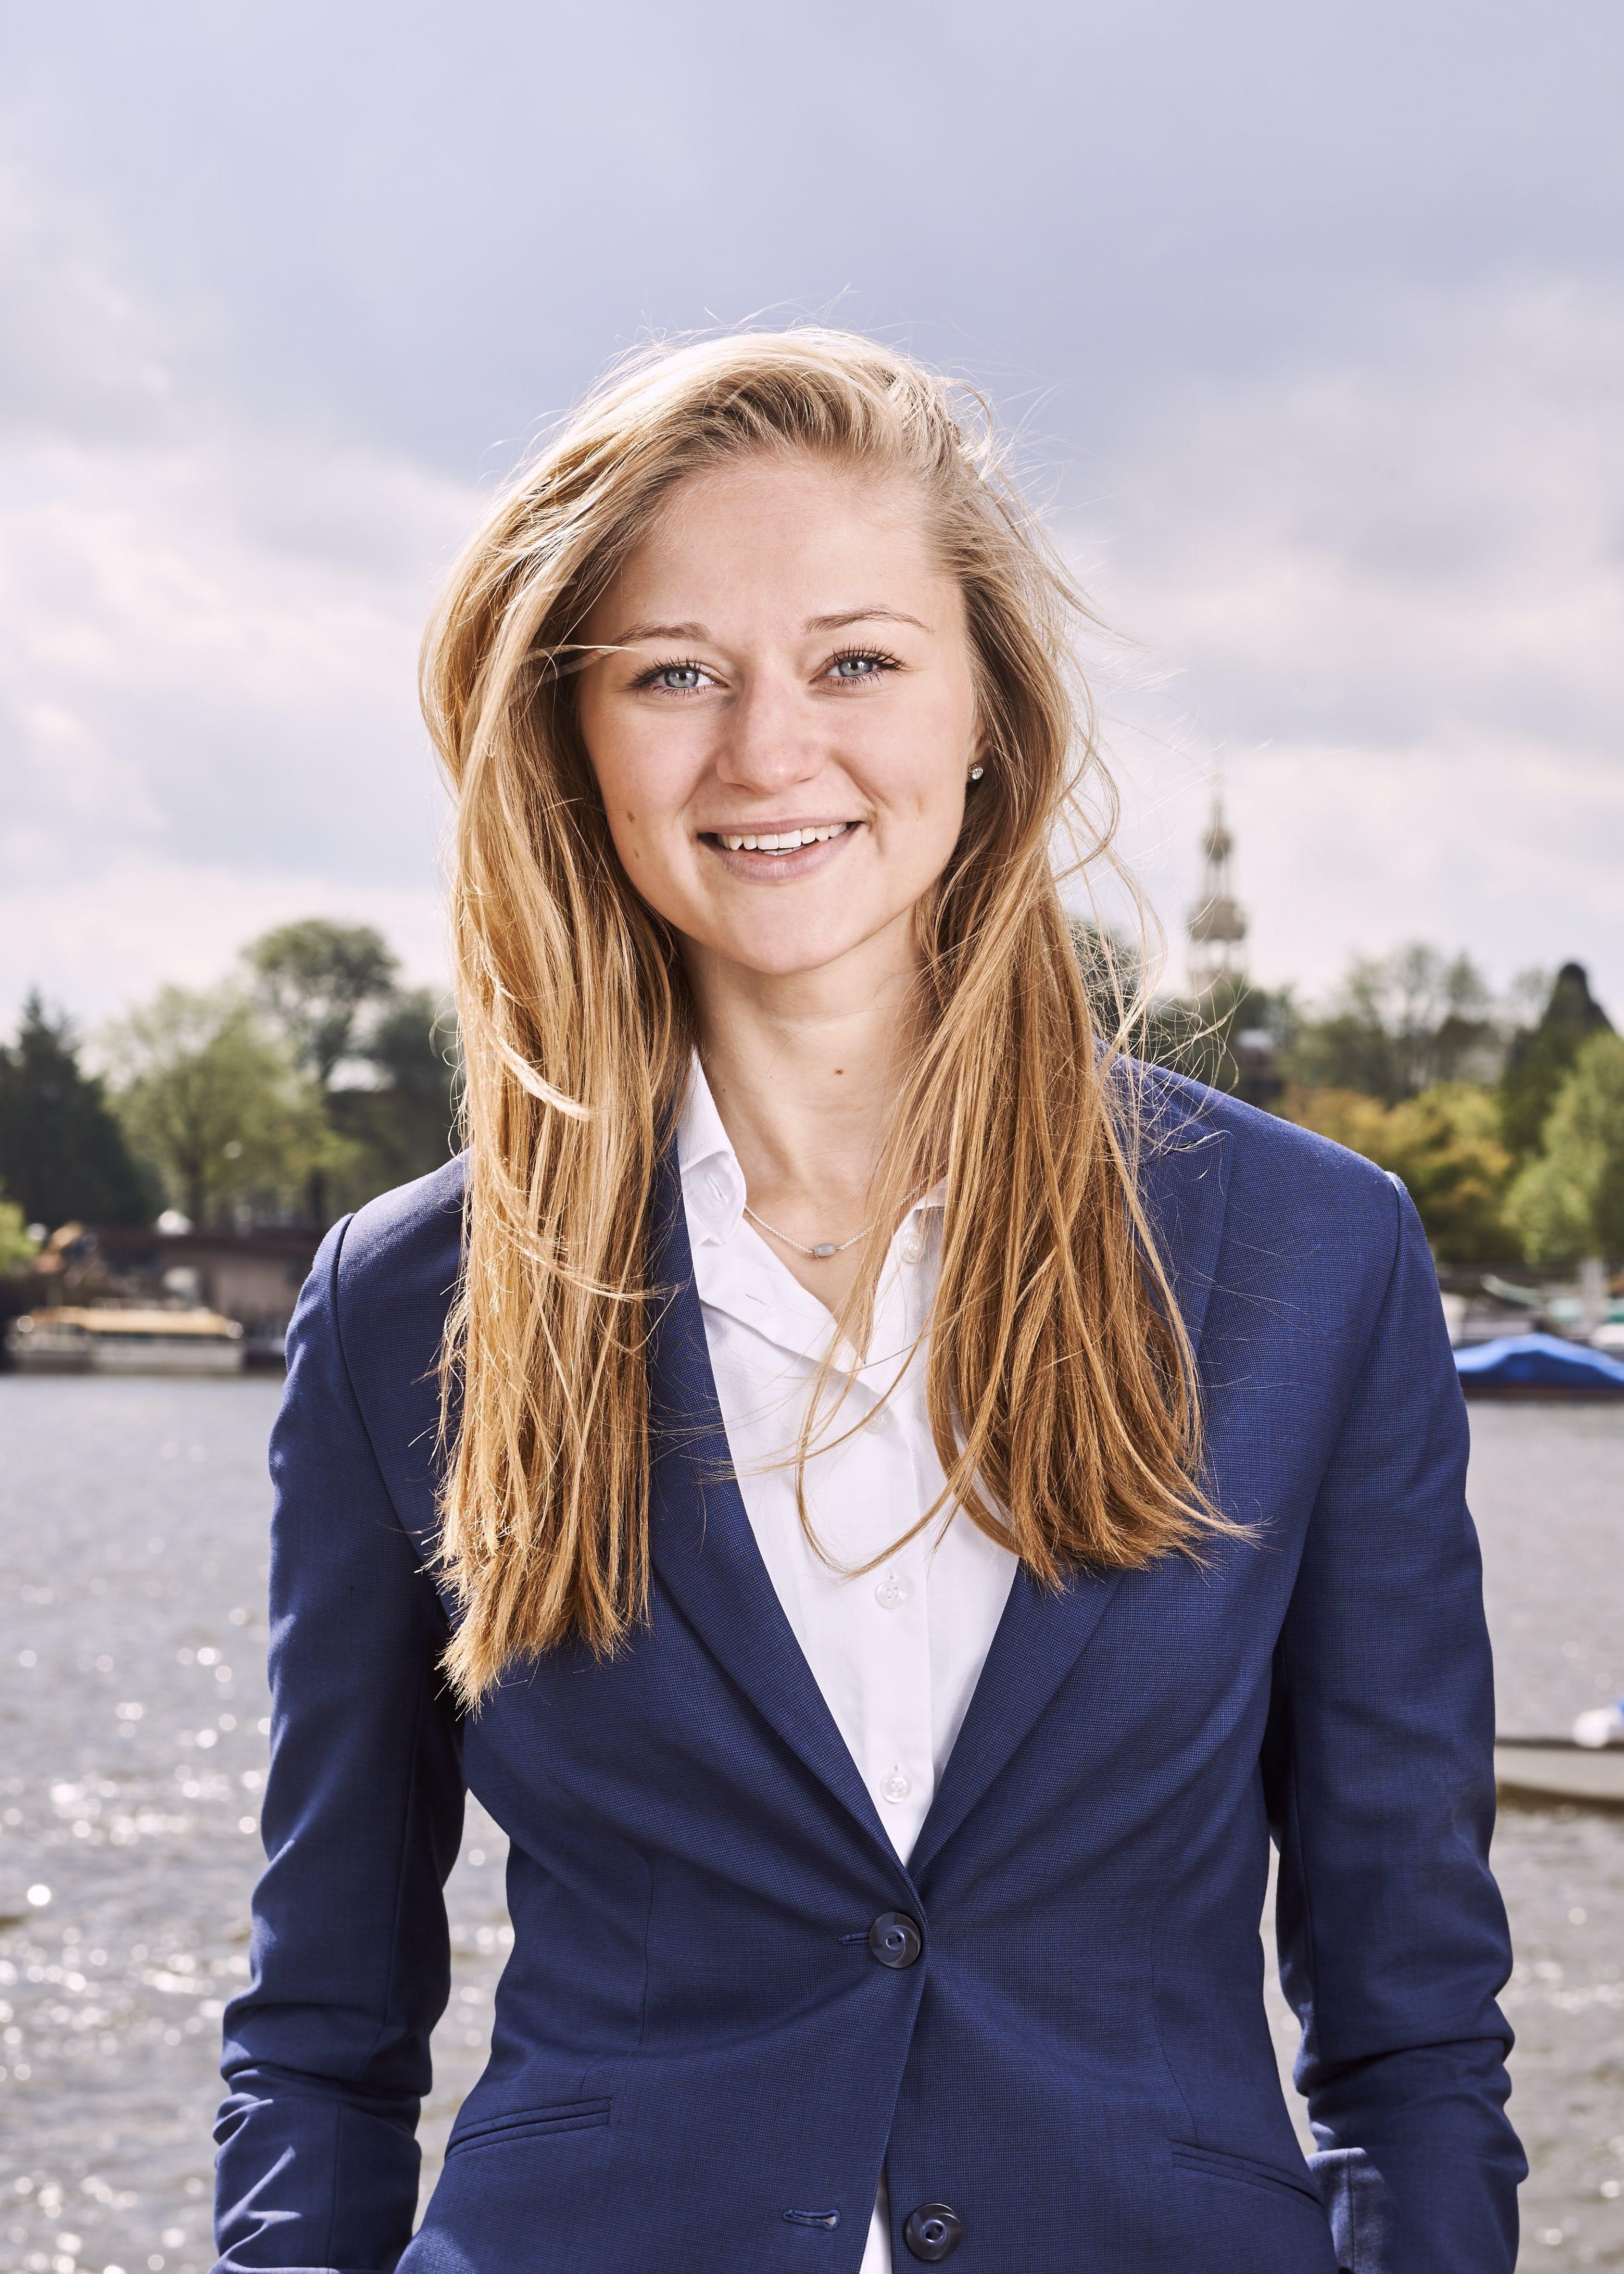 Rosa Keijsper